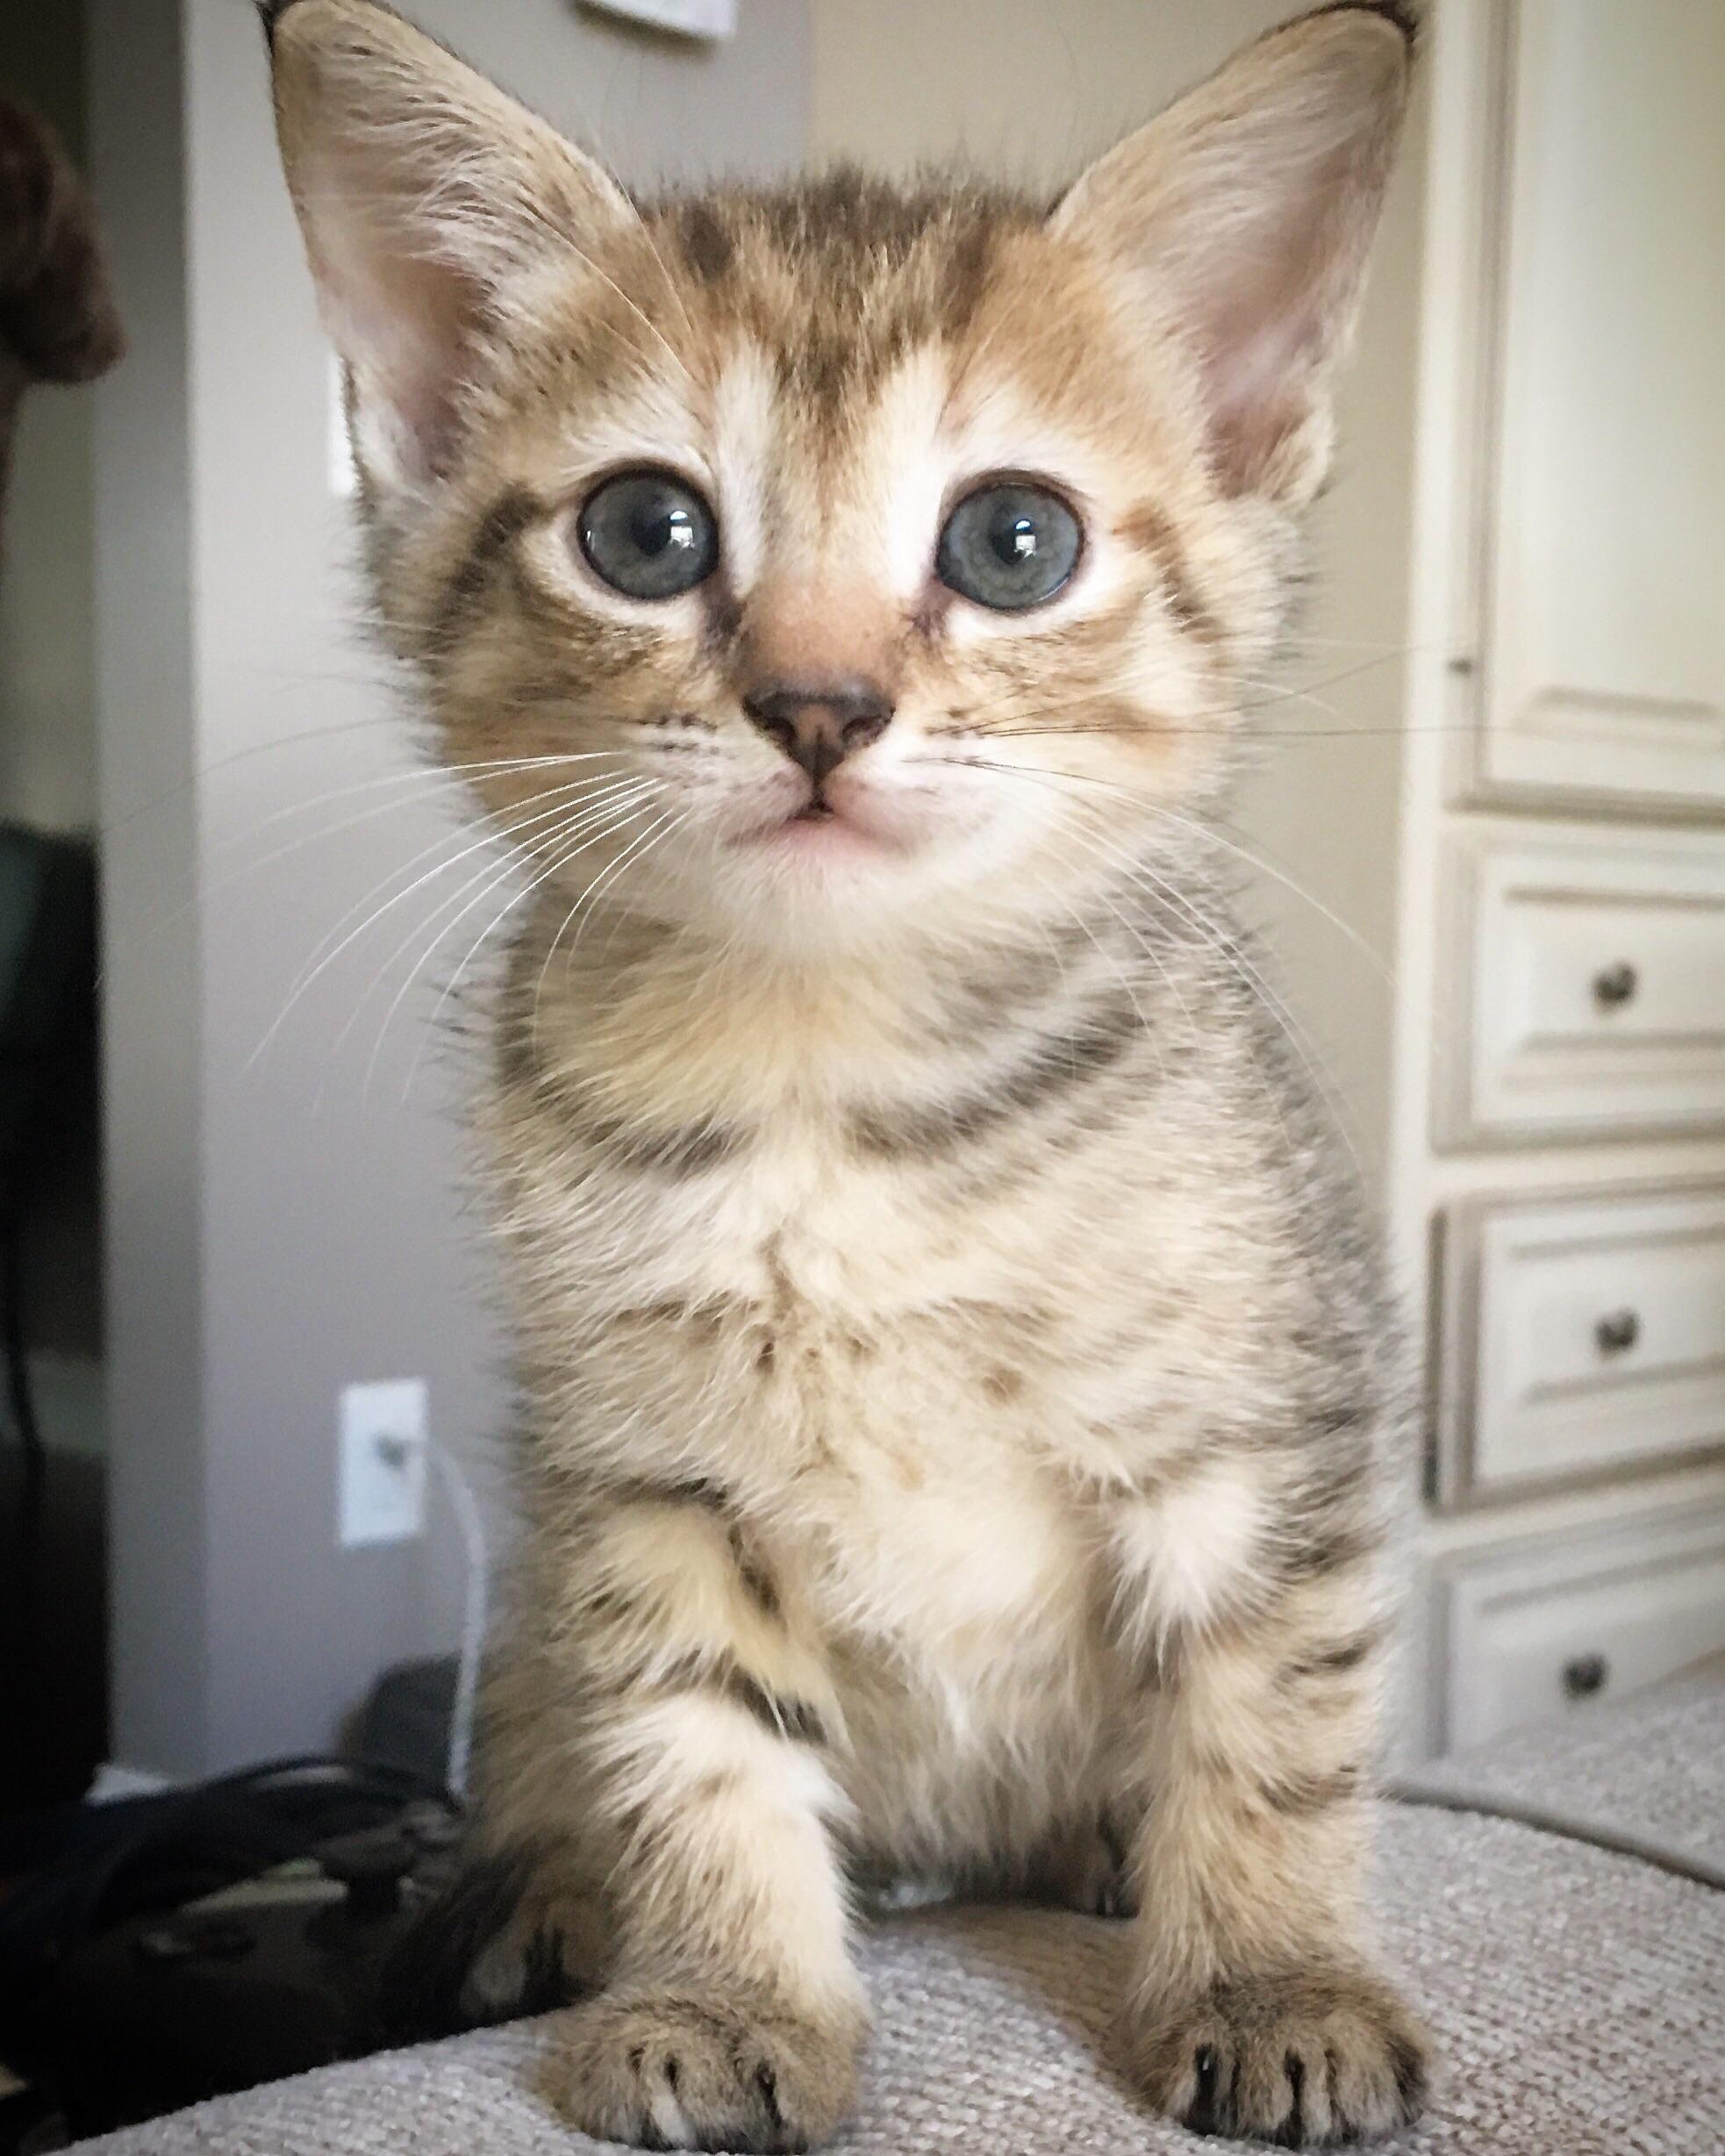 Meet Delilah the newest member of the family http://ift.tt/2xq8l6l